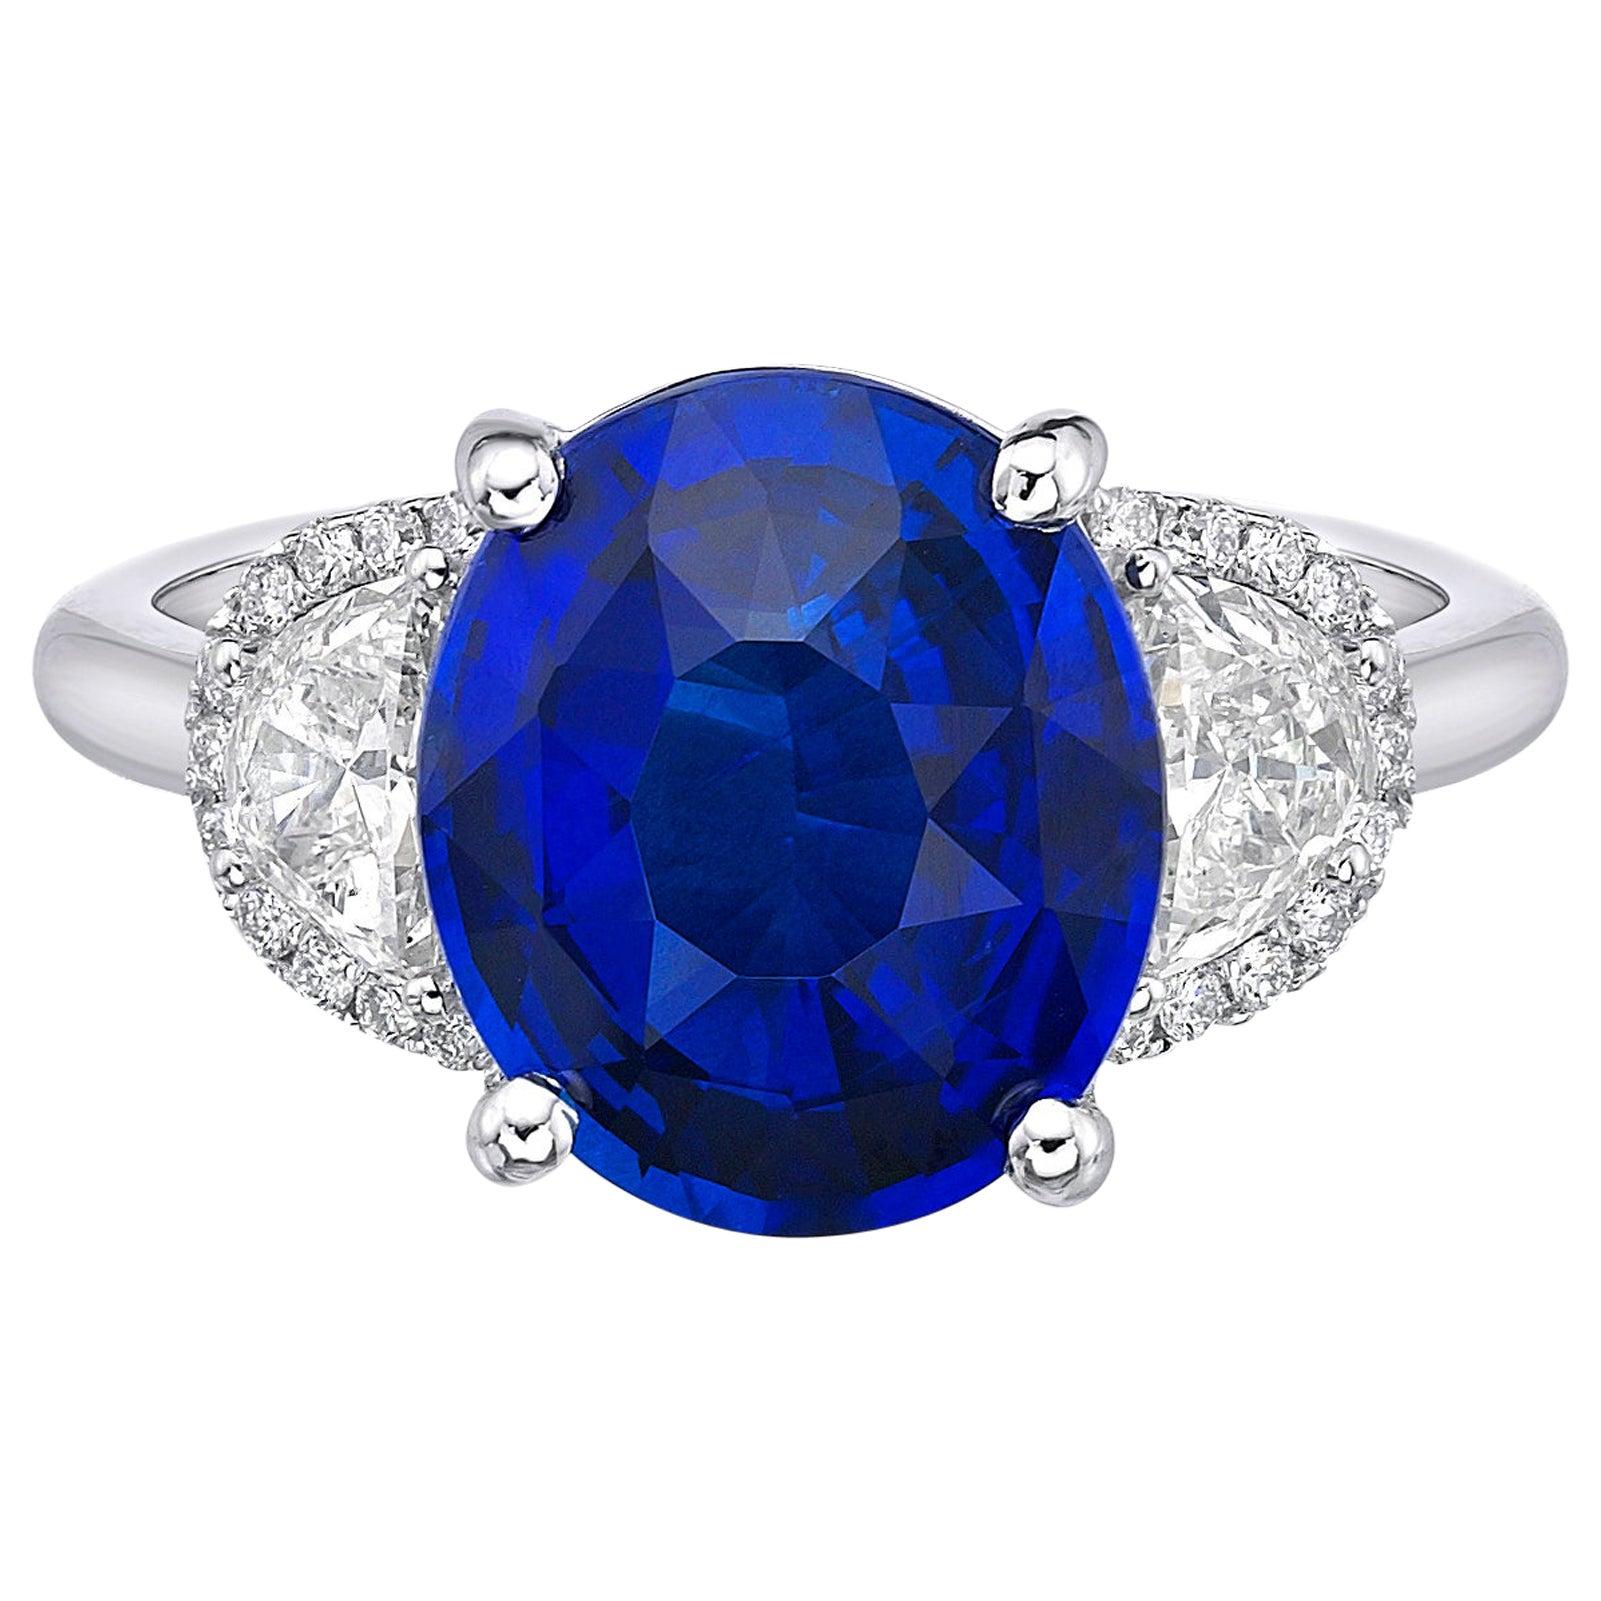 4.73 Carat Royal Blue Sapphire GRS Certified Diamond Ceylon Ring Oval Cut